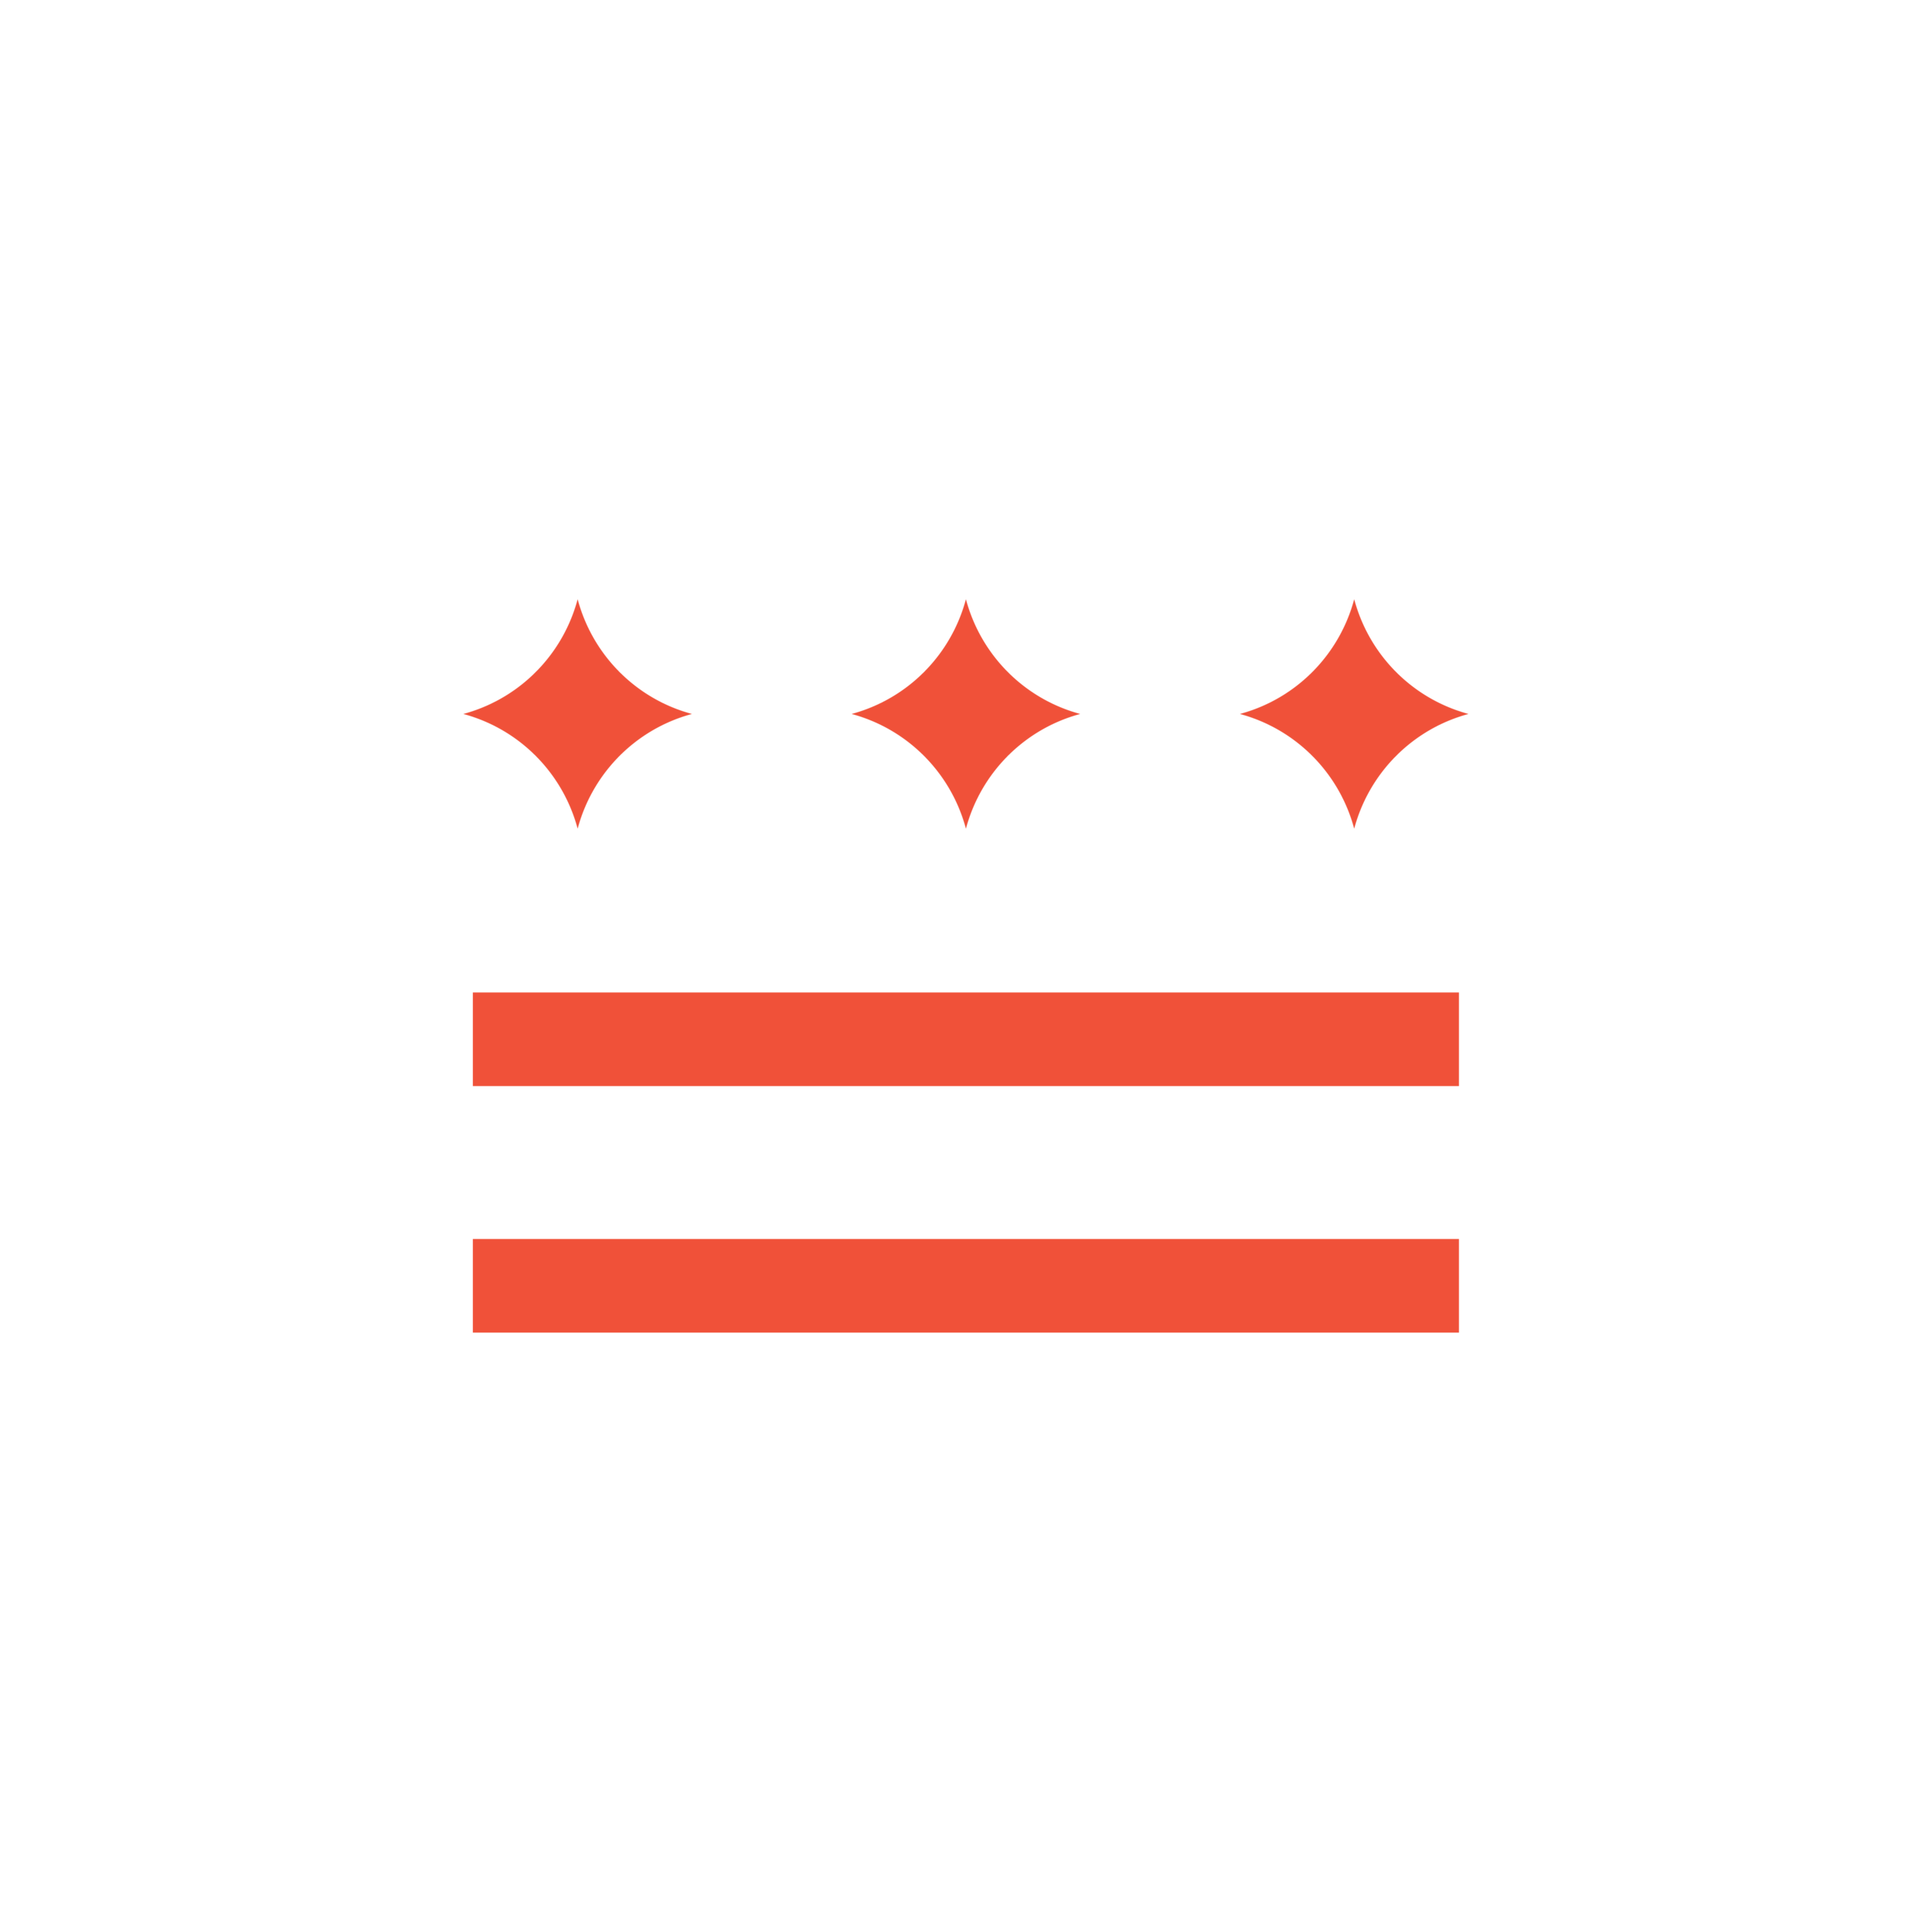 Toastworthy_DC-Flag_orange.png